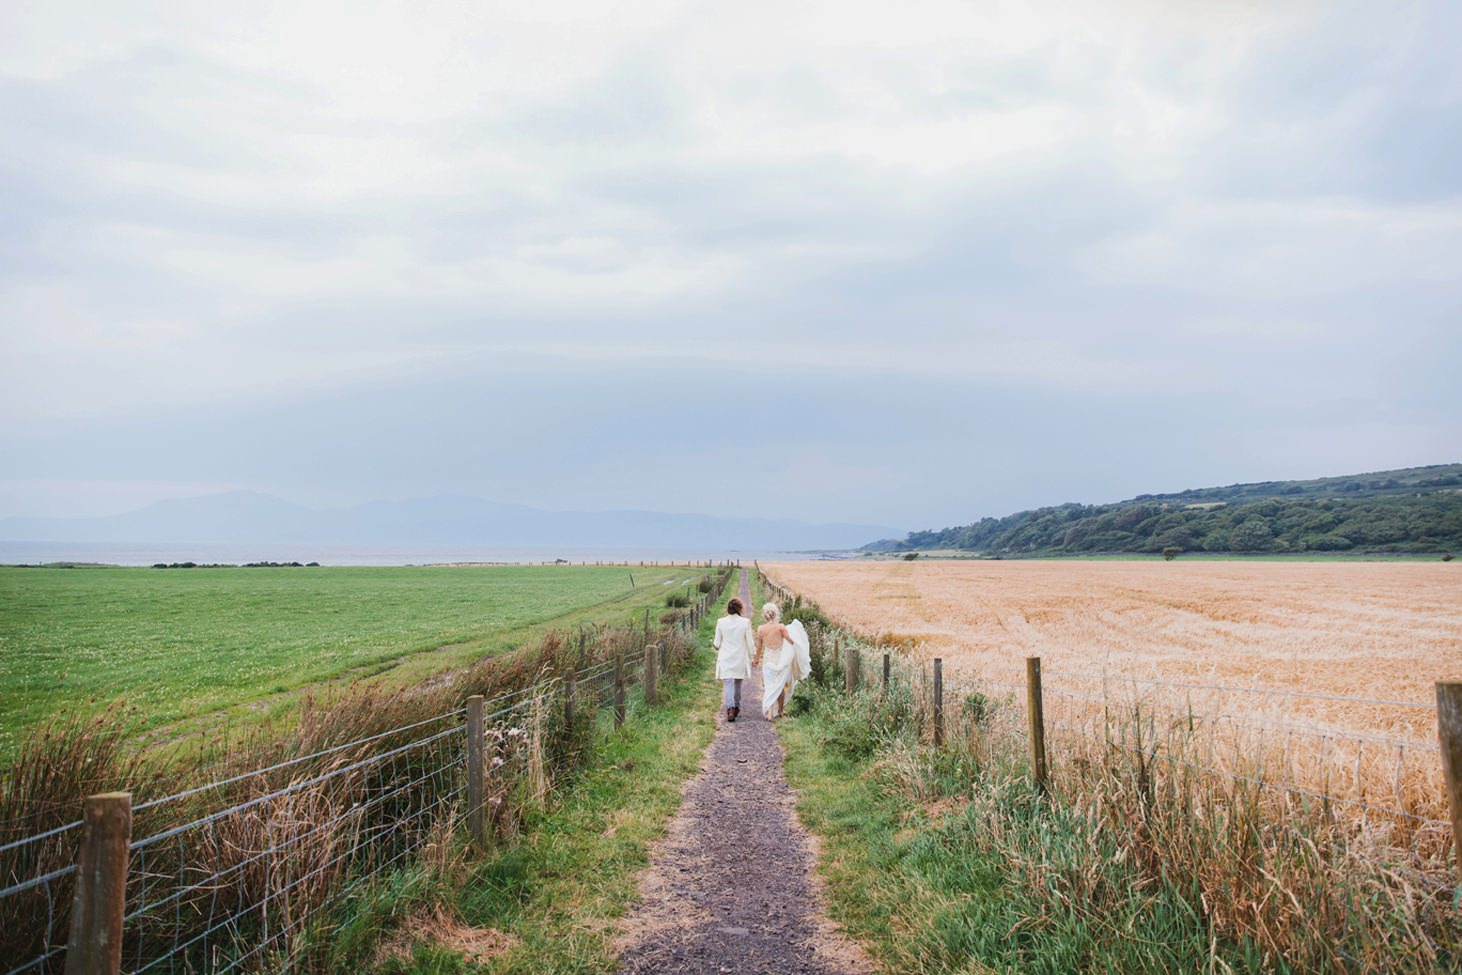 isle of bute wedding photography bride and groom walking along path